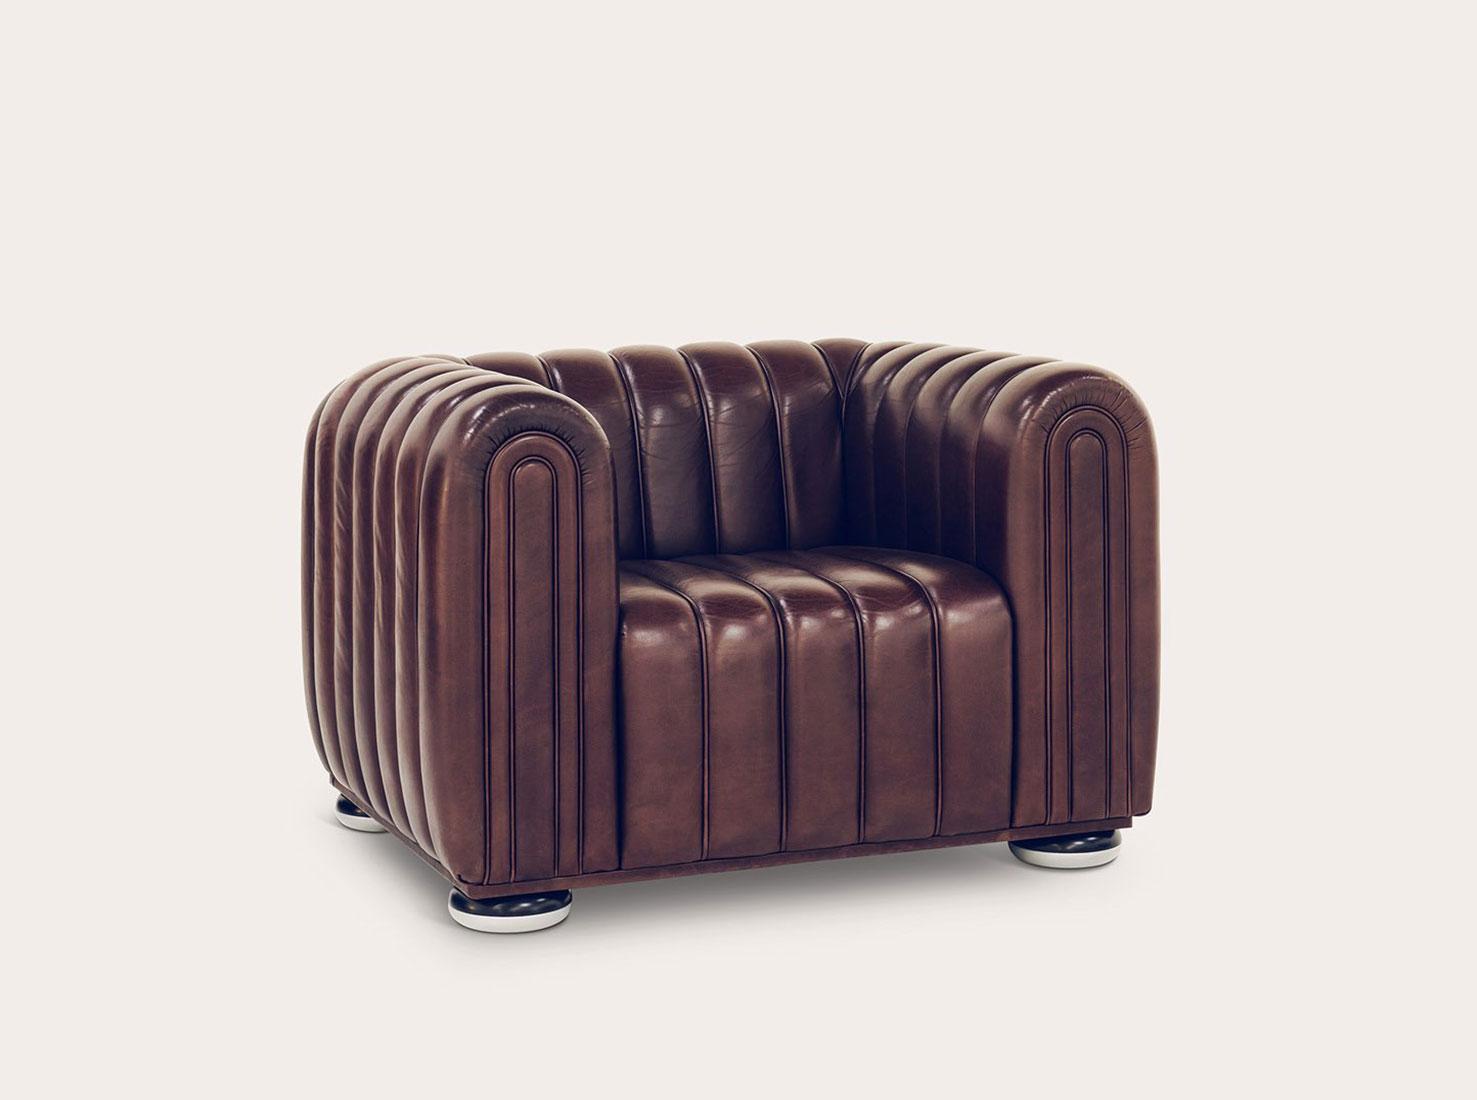 Йозеф Хоффманн мебель фото